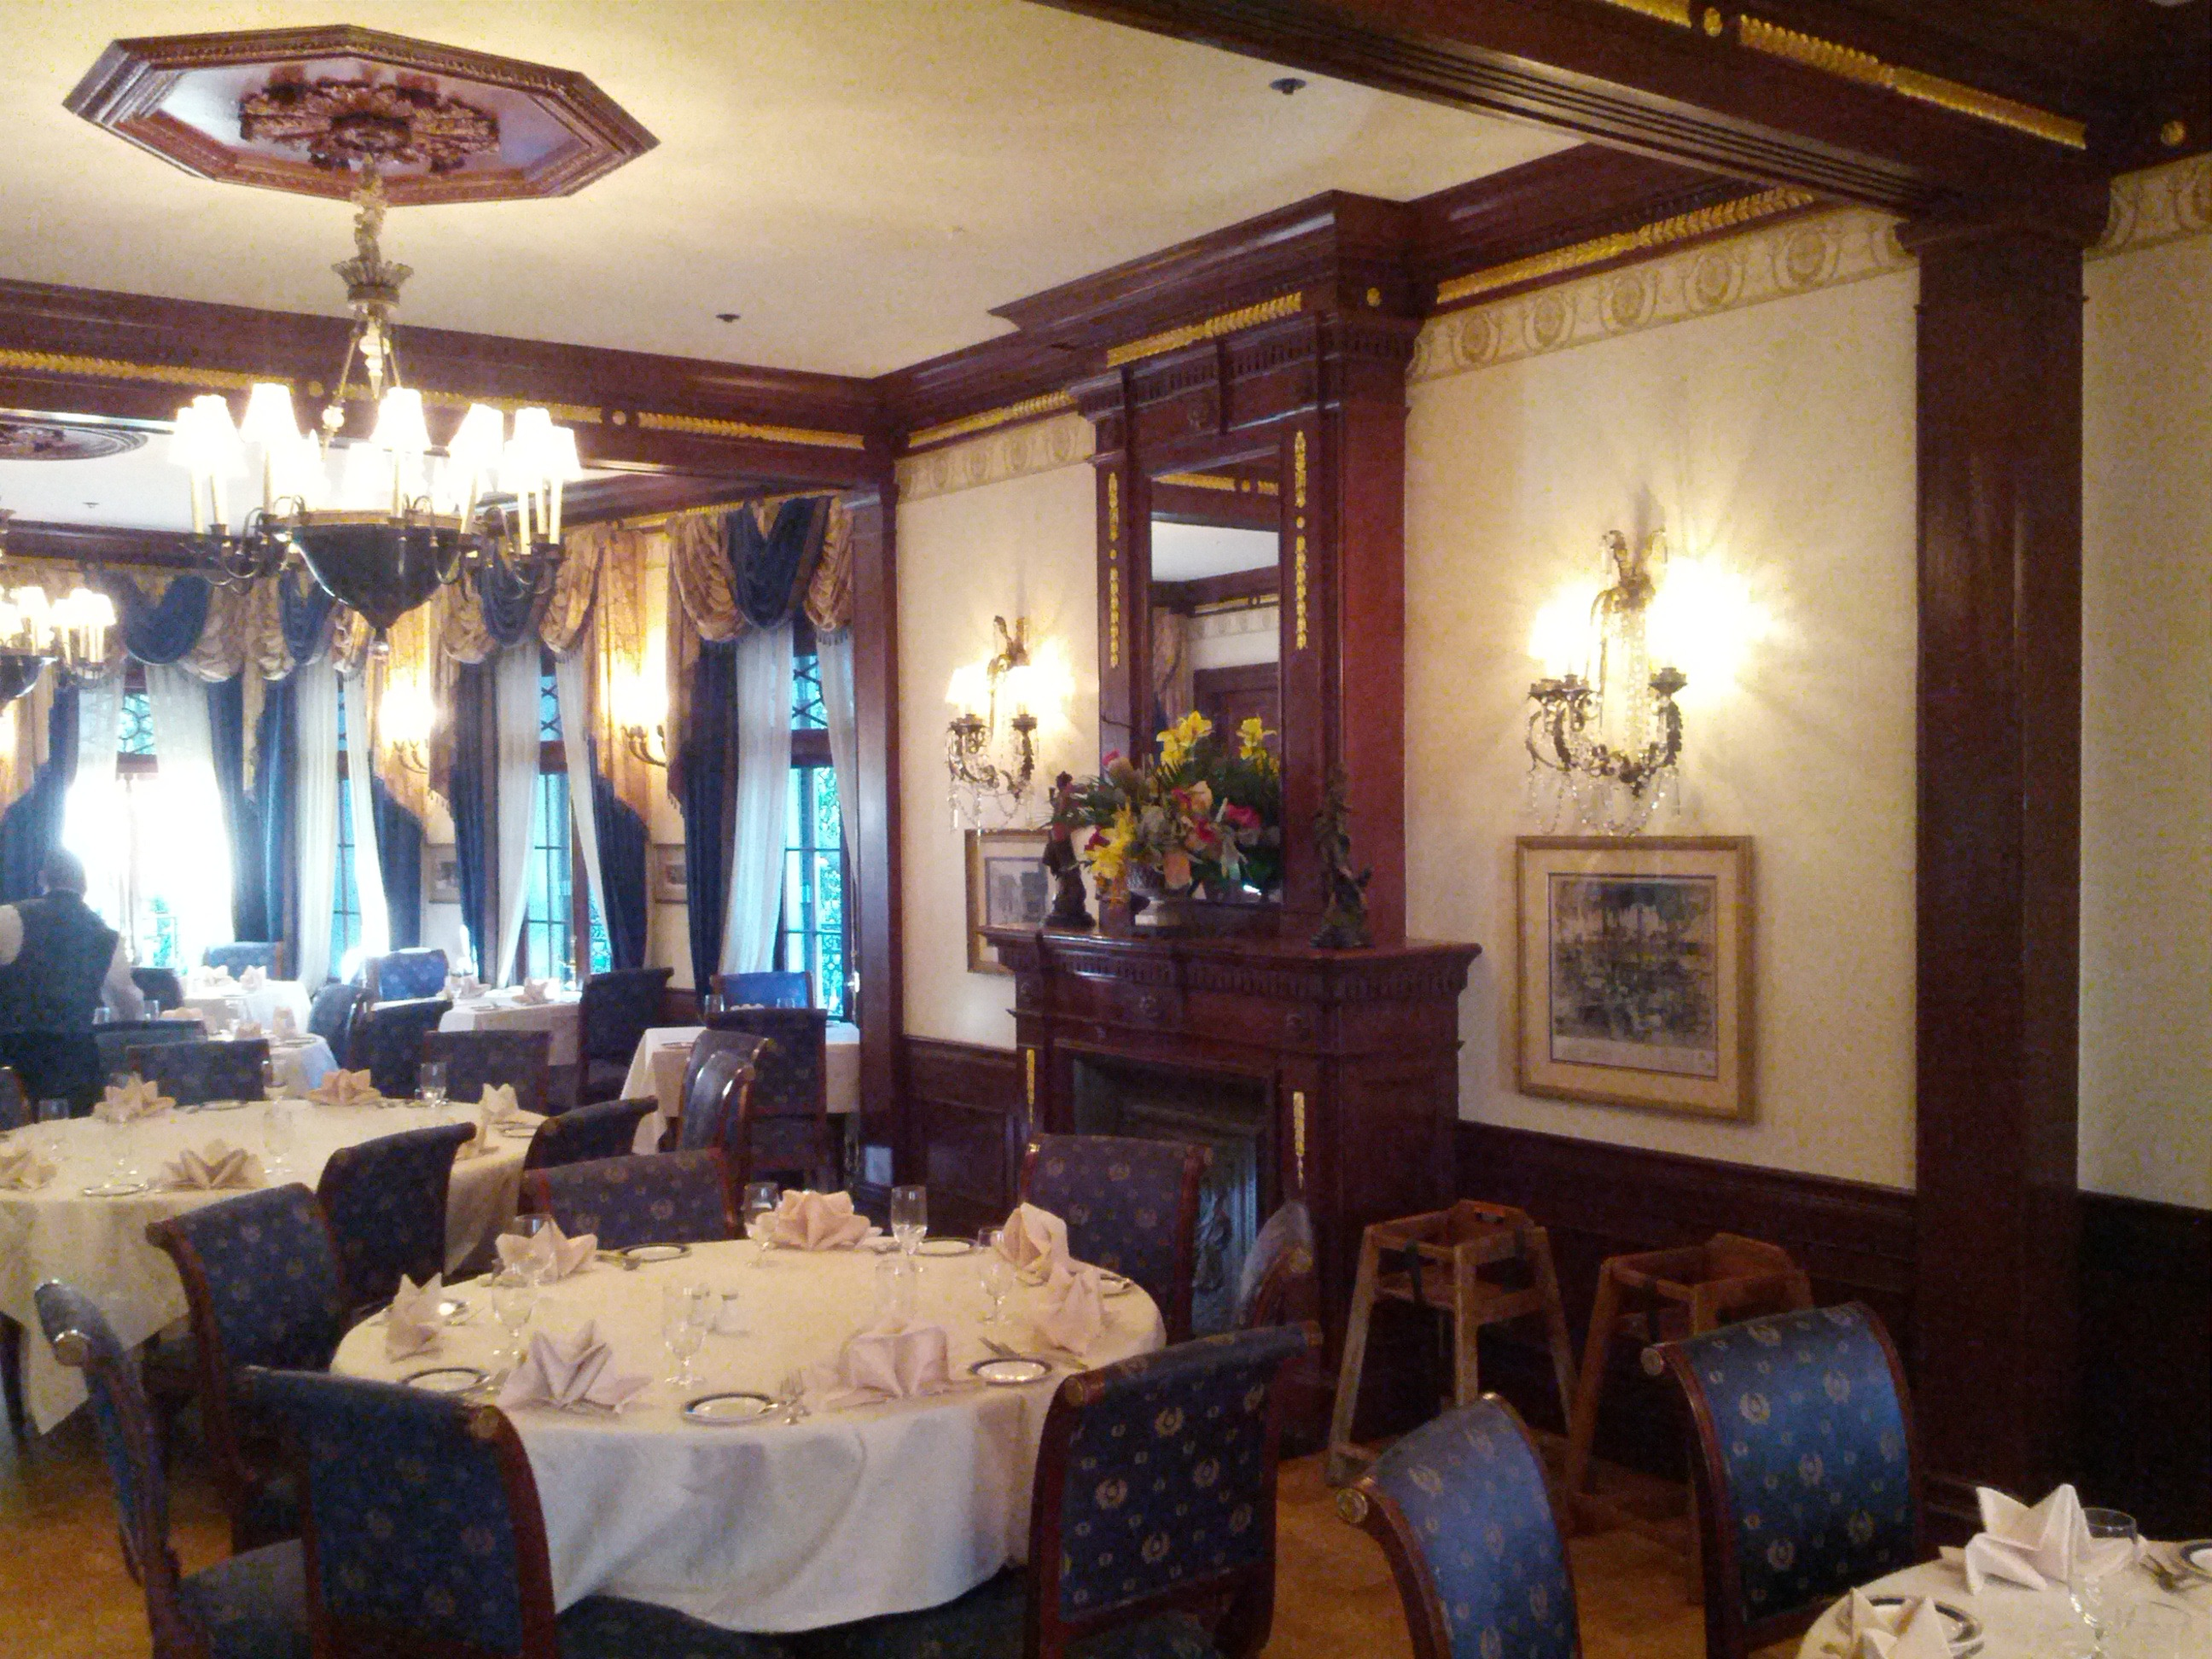 Club 33 dining room